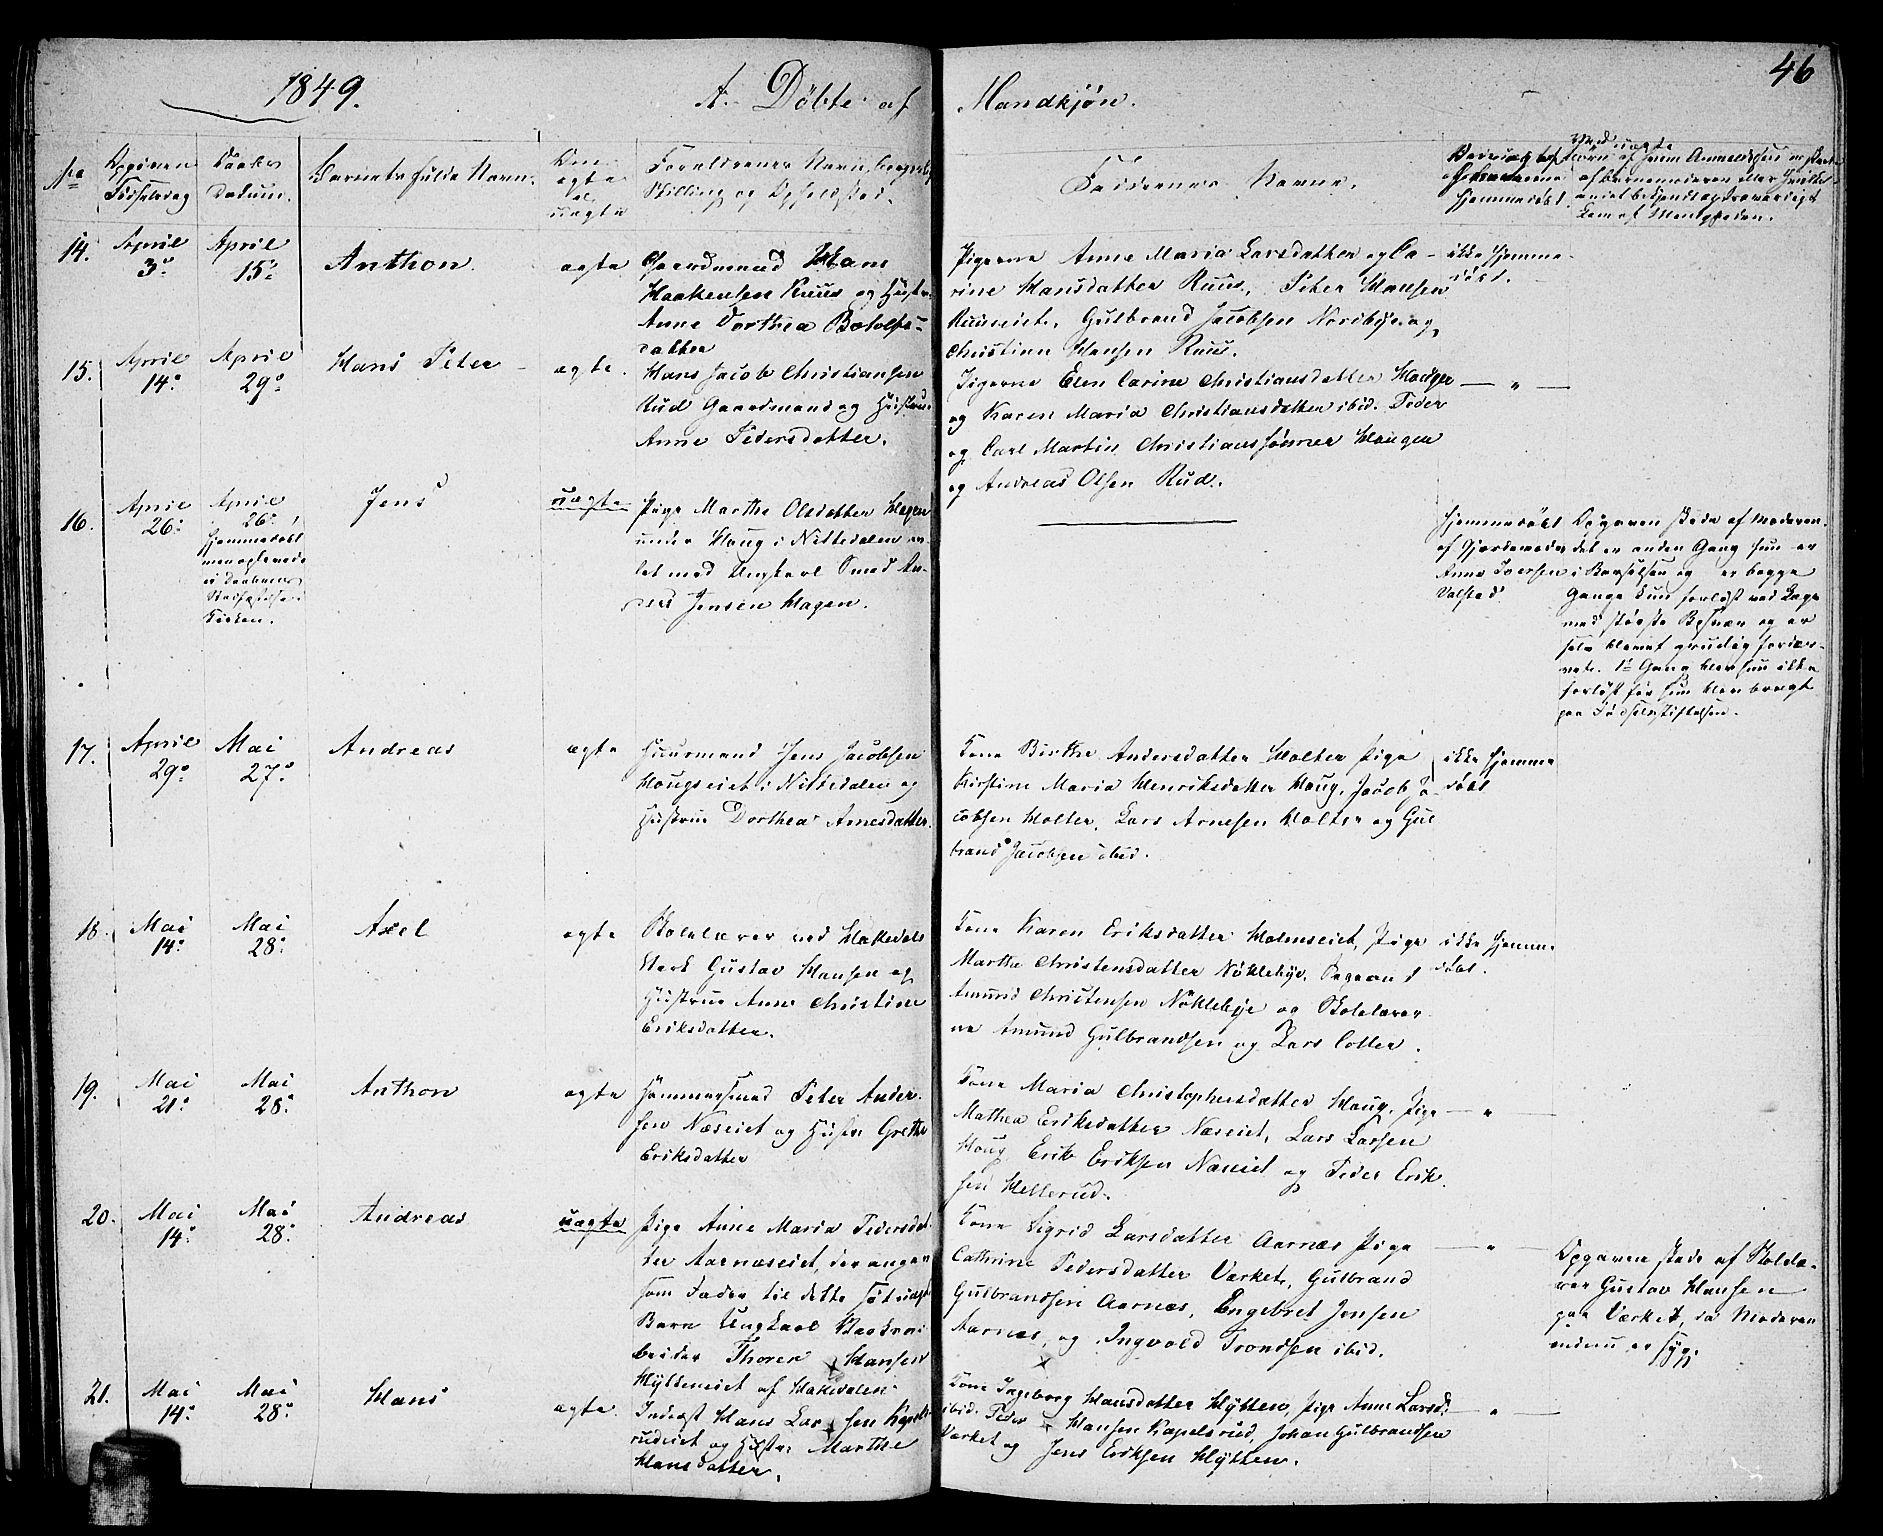 SAO, Nittedal prestekontor Kirkebøker, F/Fa/L0004: Ministerialbok nr. I 4, 1836-1849, s. 46